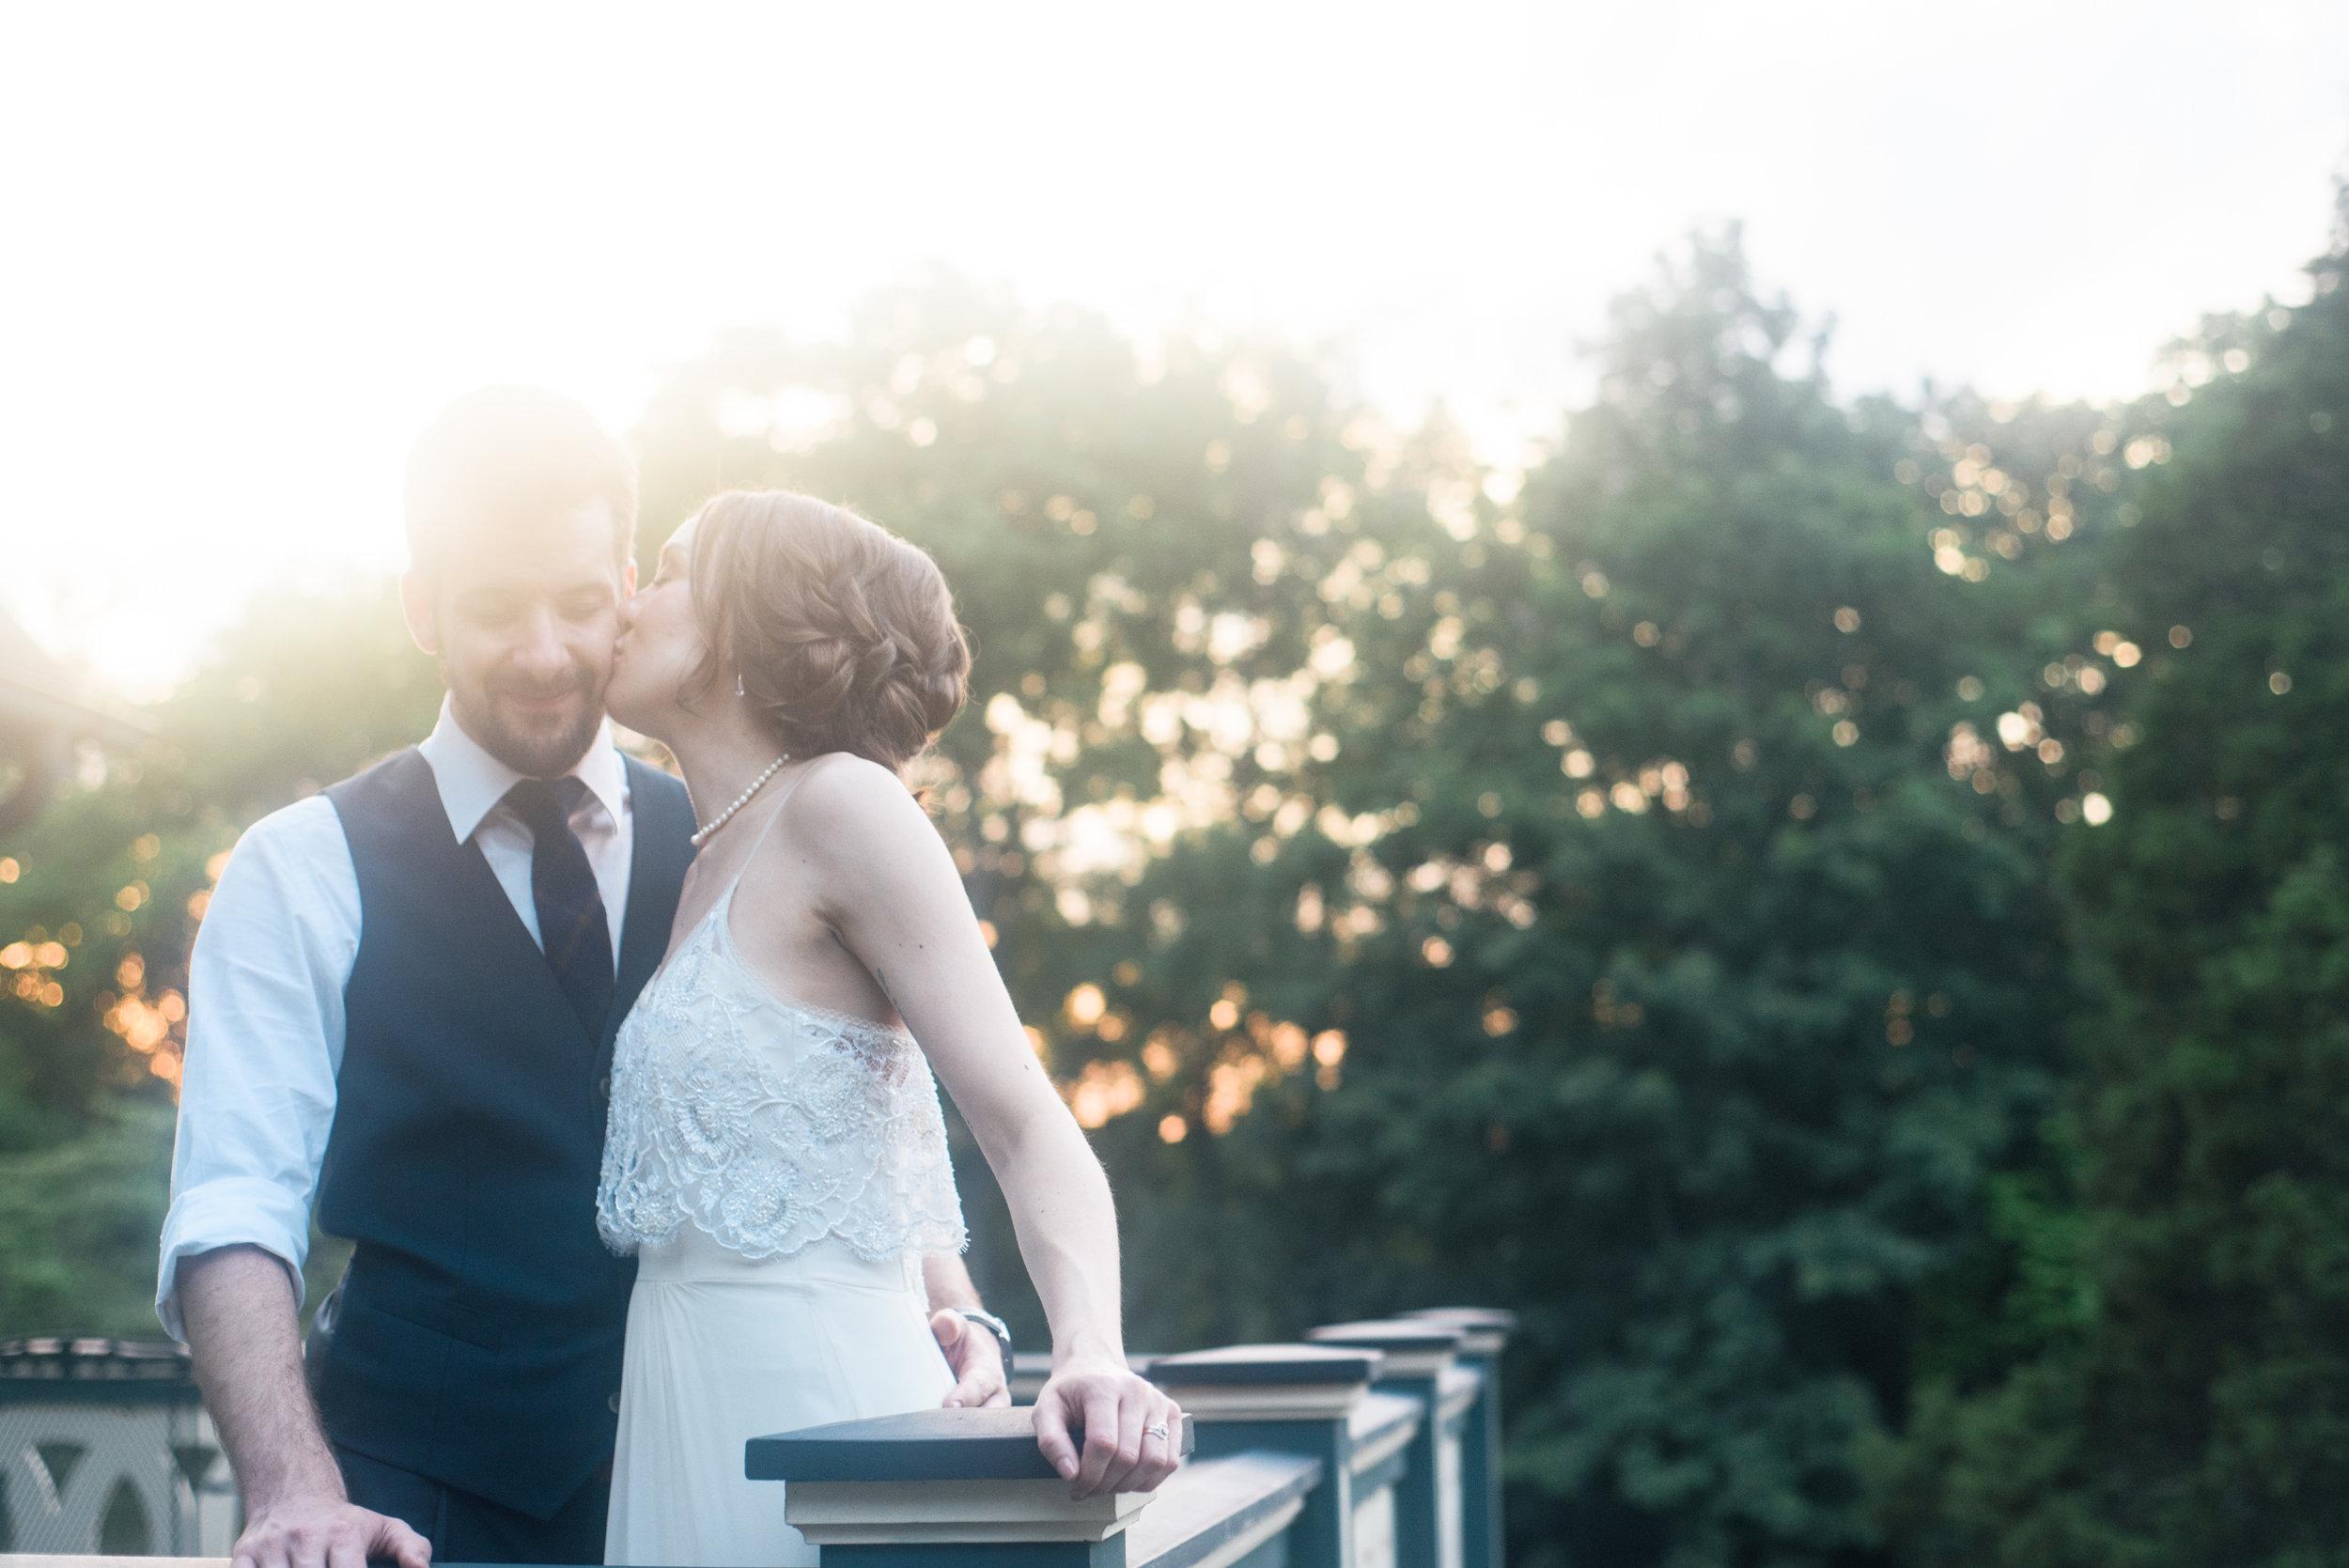 lauren-and-tim-north-carolina-wedding-meg-hill-photo- (1279 of 1087).jpg